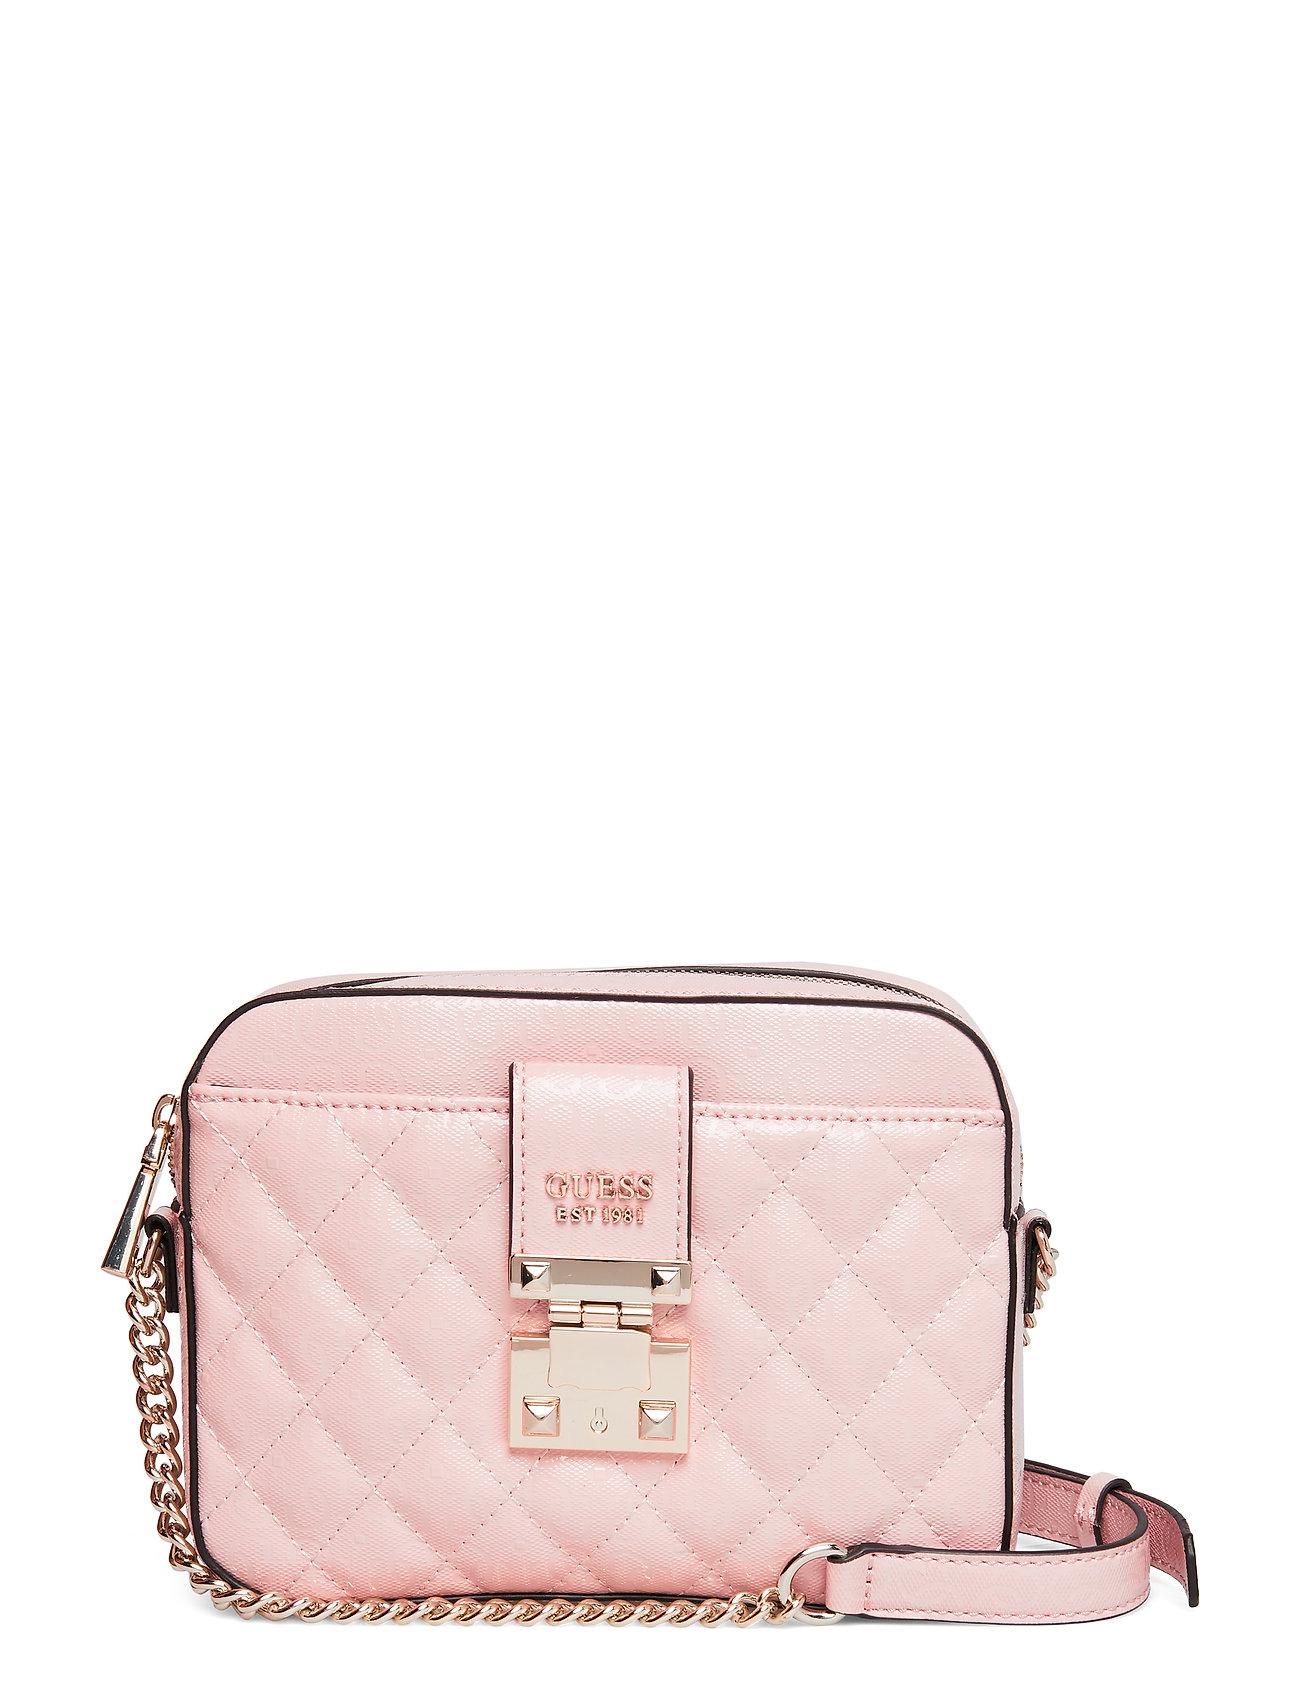 Image of Tiggy Camera Bag Bags Small Shoulder Bags/crossbody Bags Lyserød GUESS (3193759199)